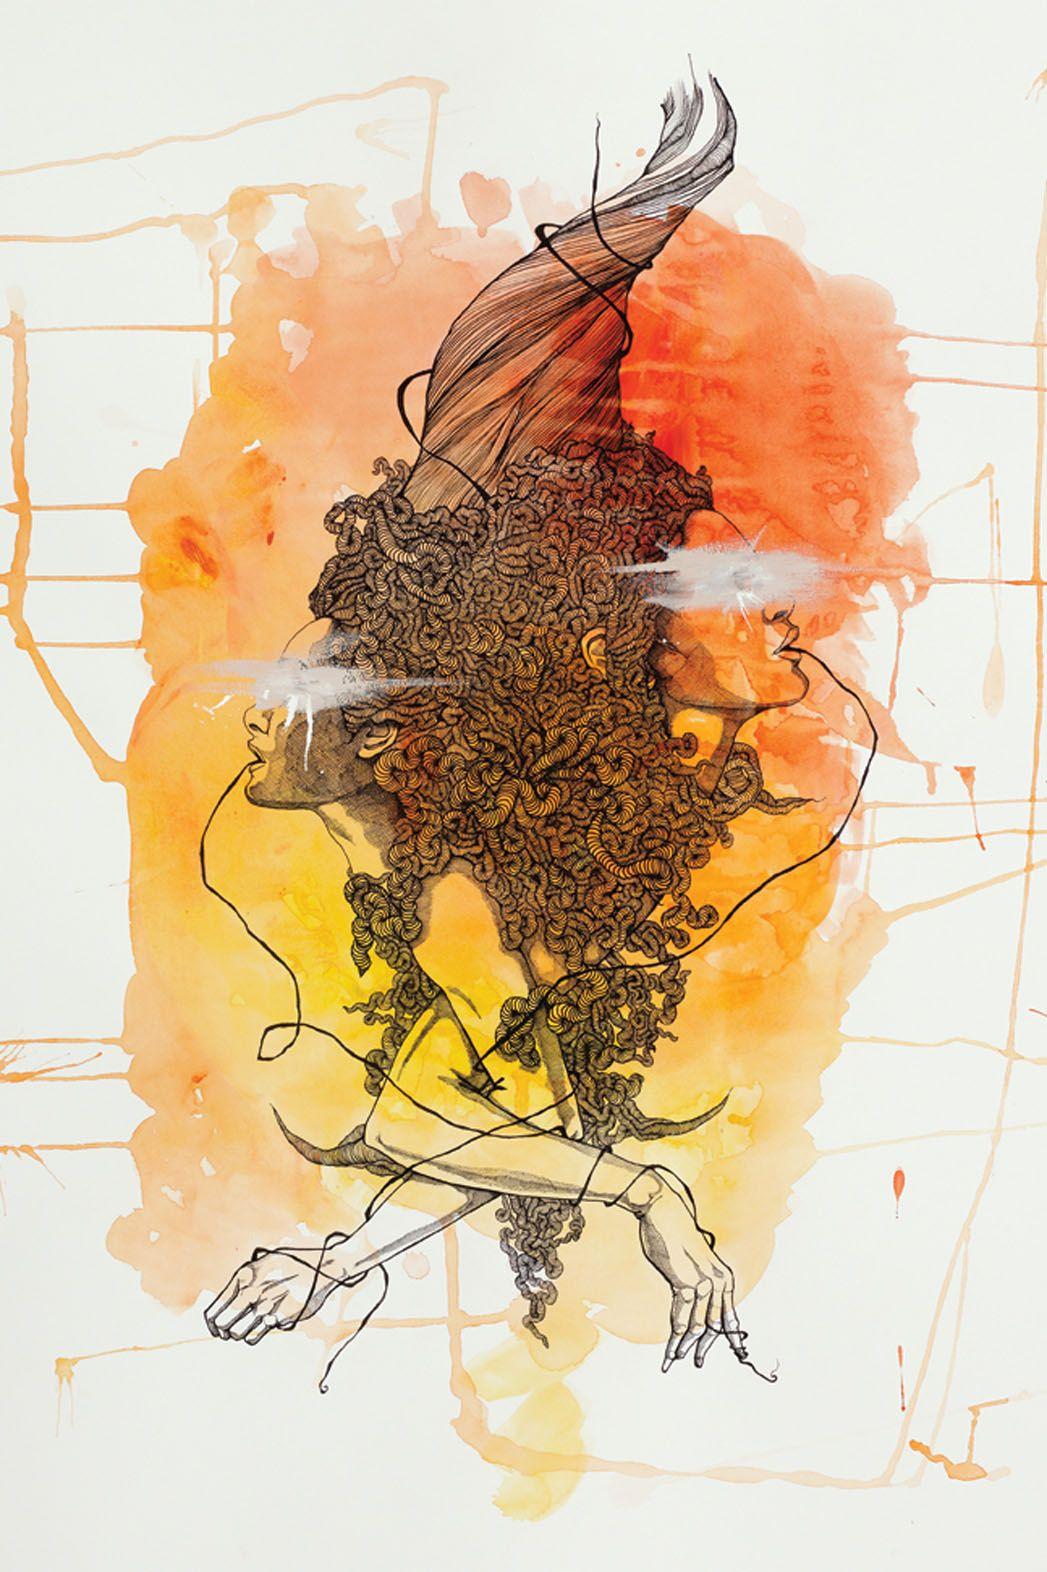 Another incredible piece by brandon boyd brandon boyd